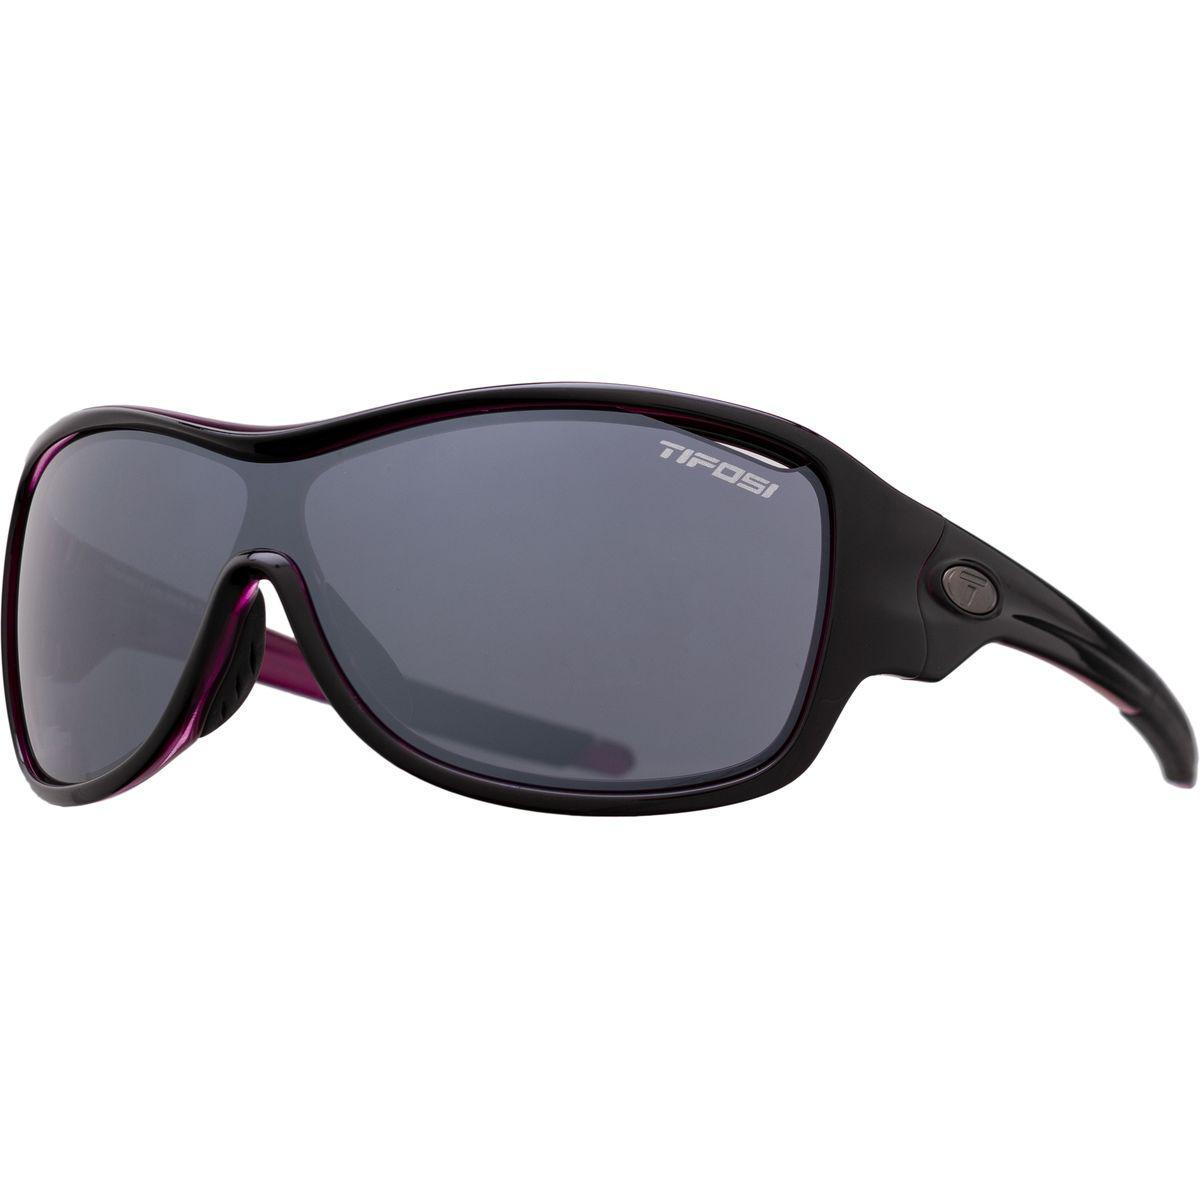 61d363403e1 Lyst - Tifosi Optics Rumor Interchangeable Sunglasses in Black